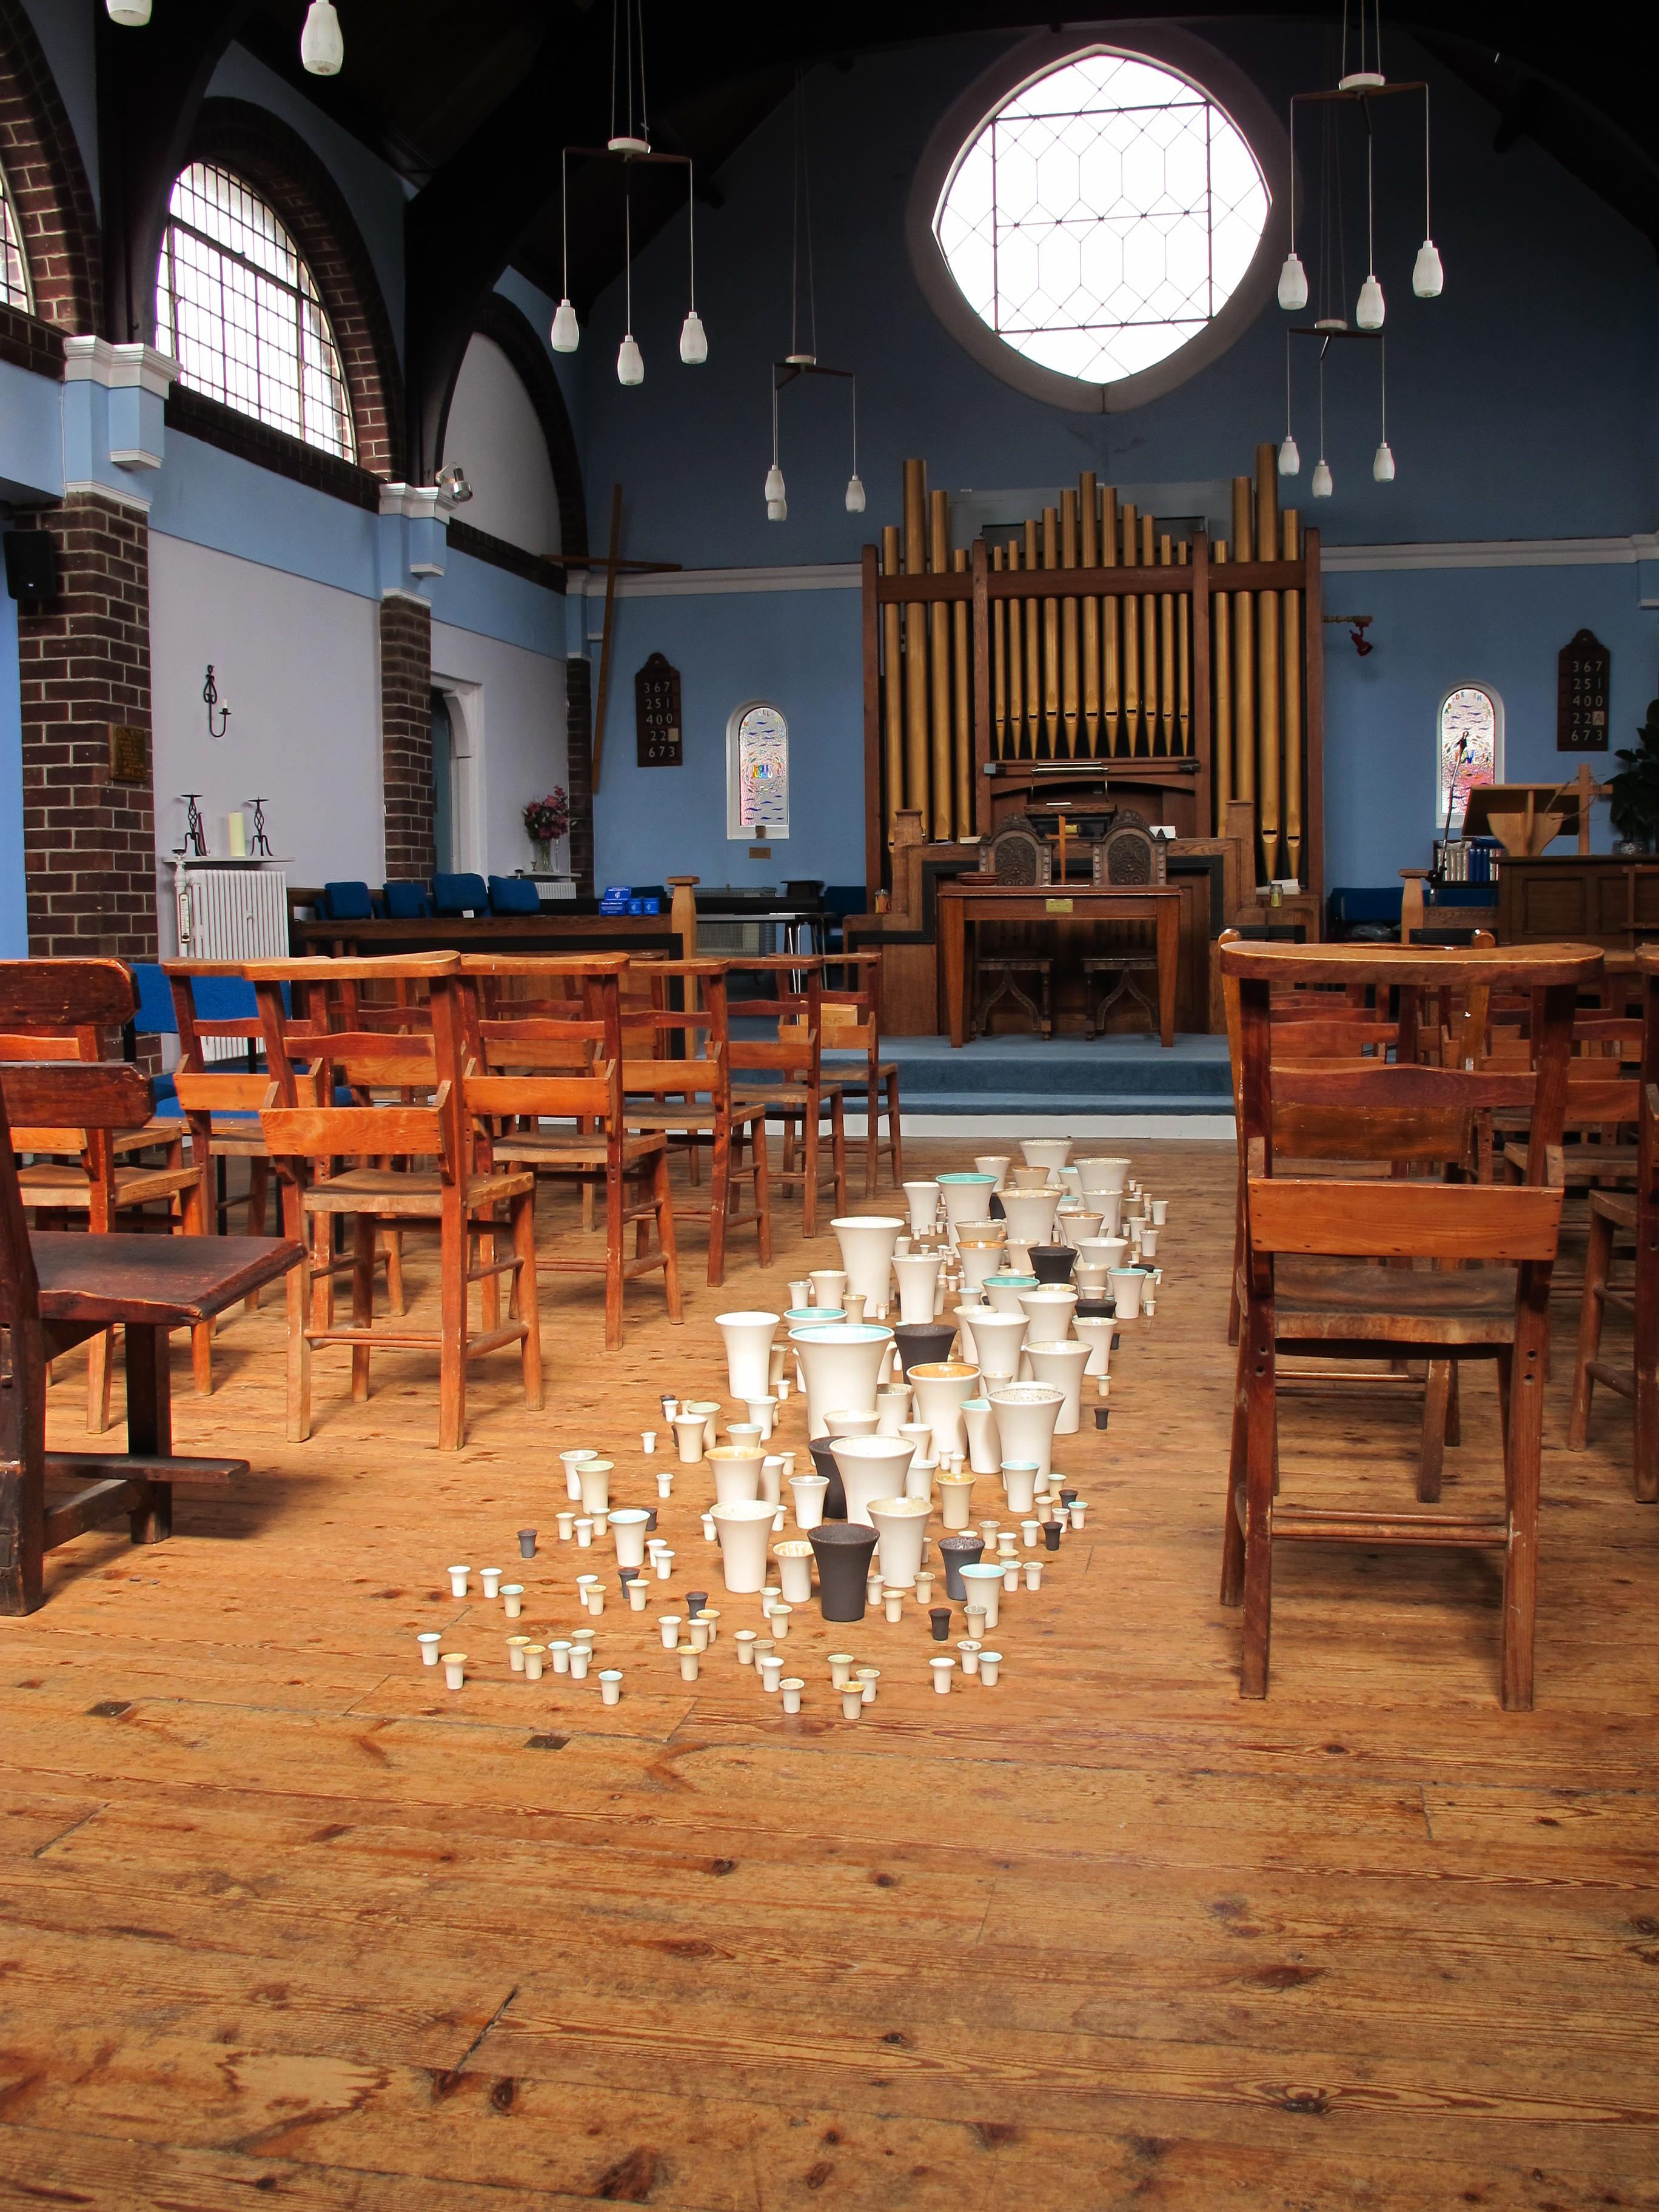 Congregation, 2015